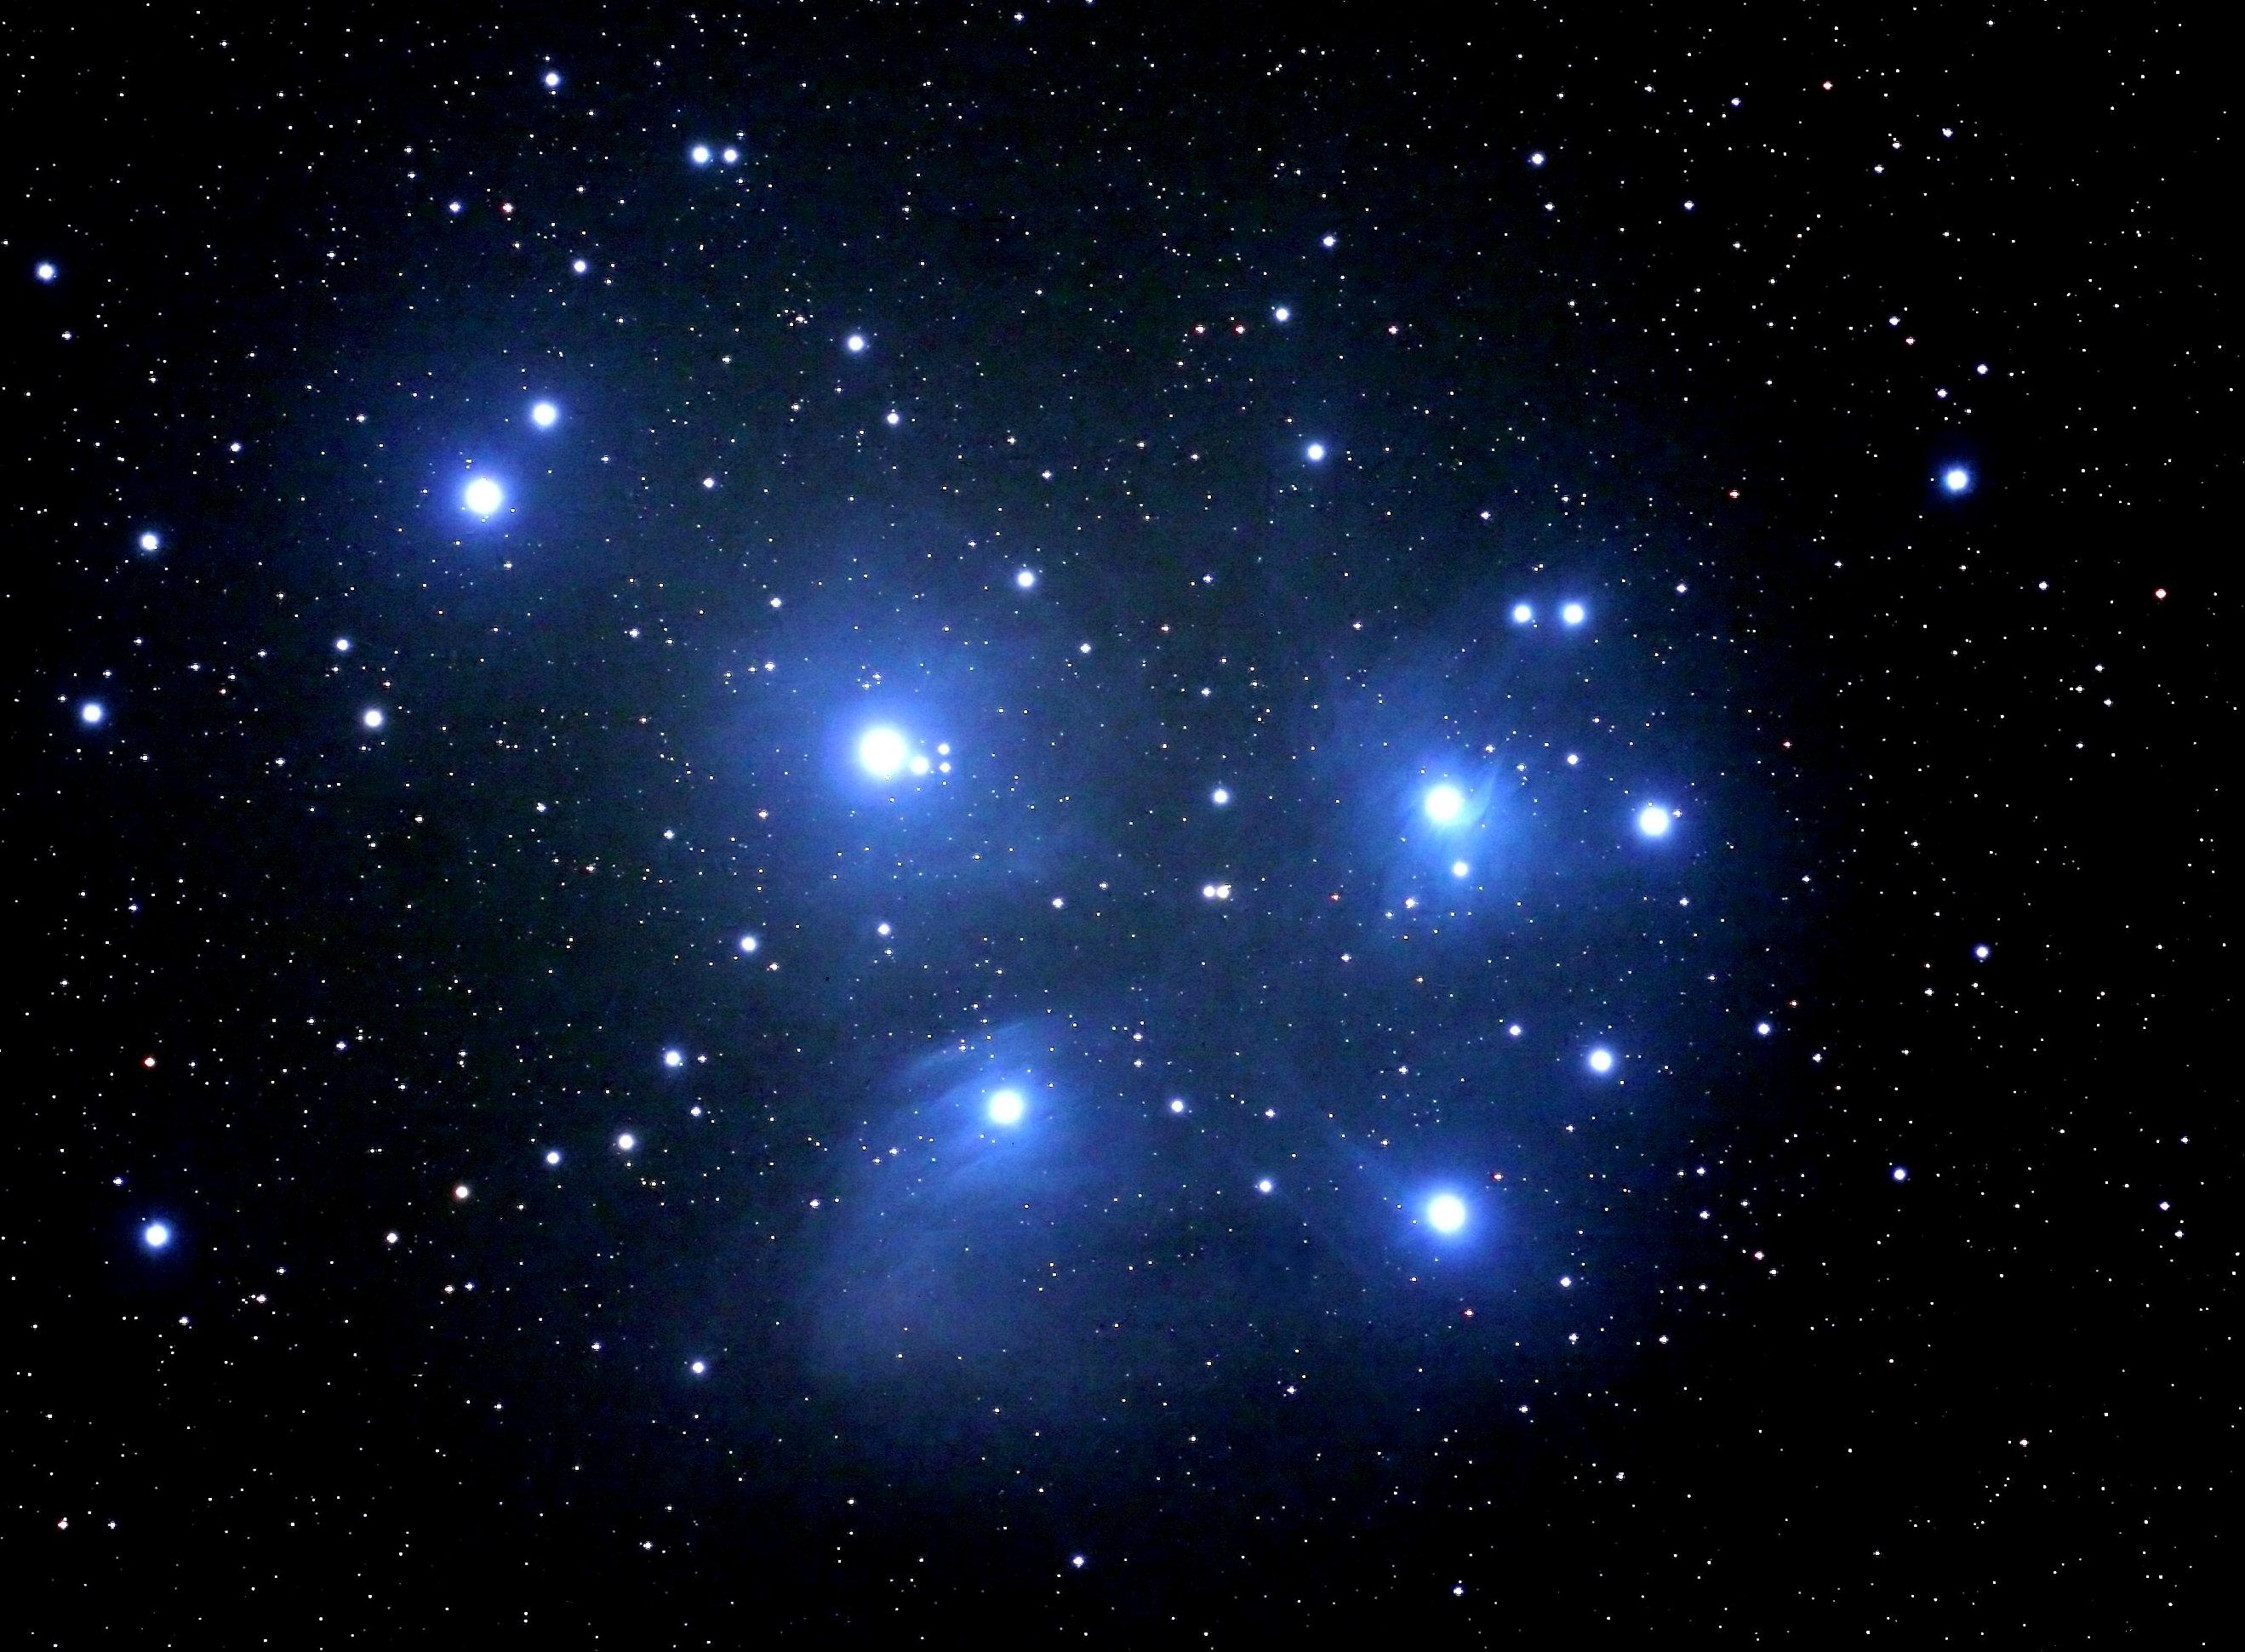 The Pleiadas, M45